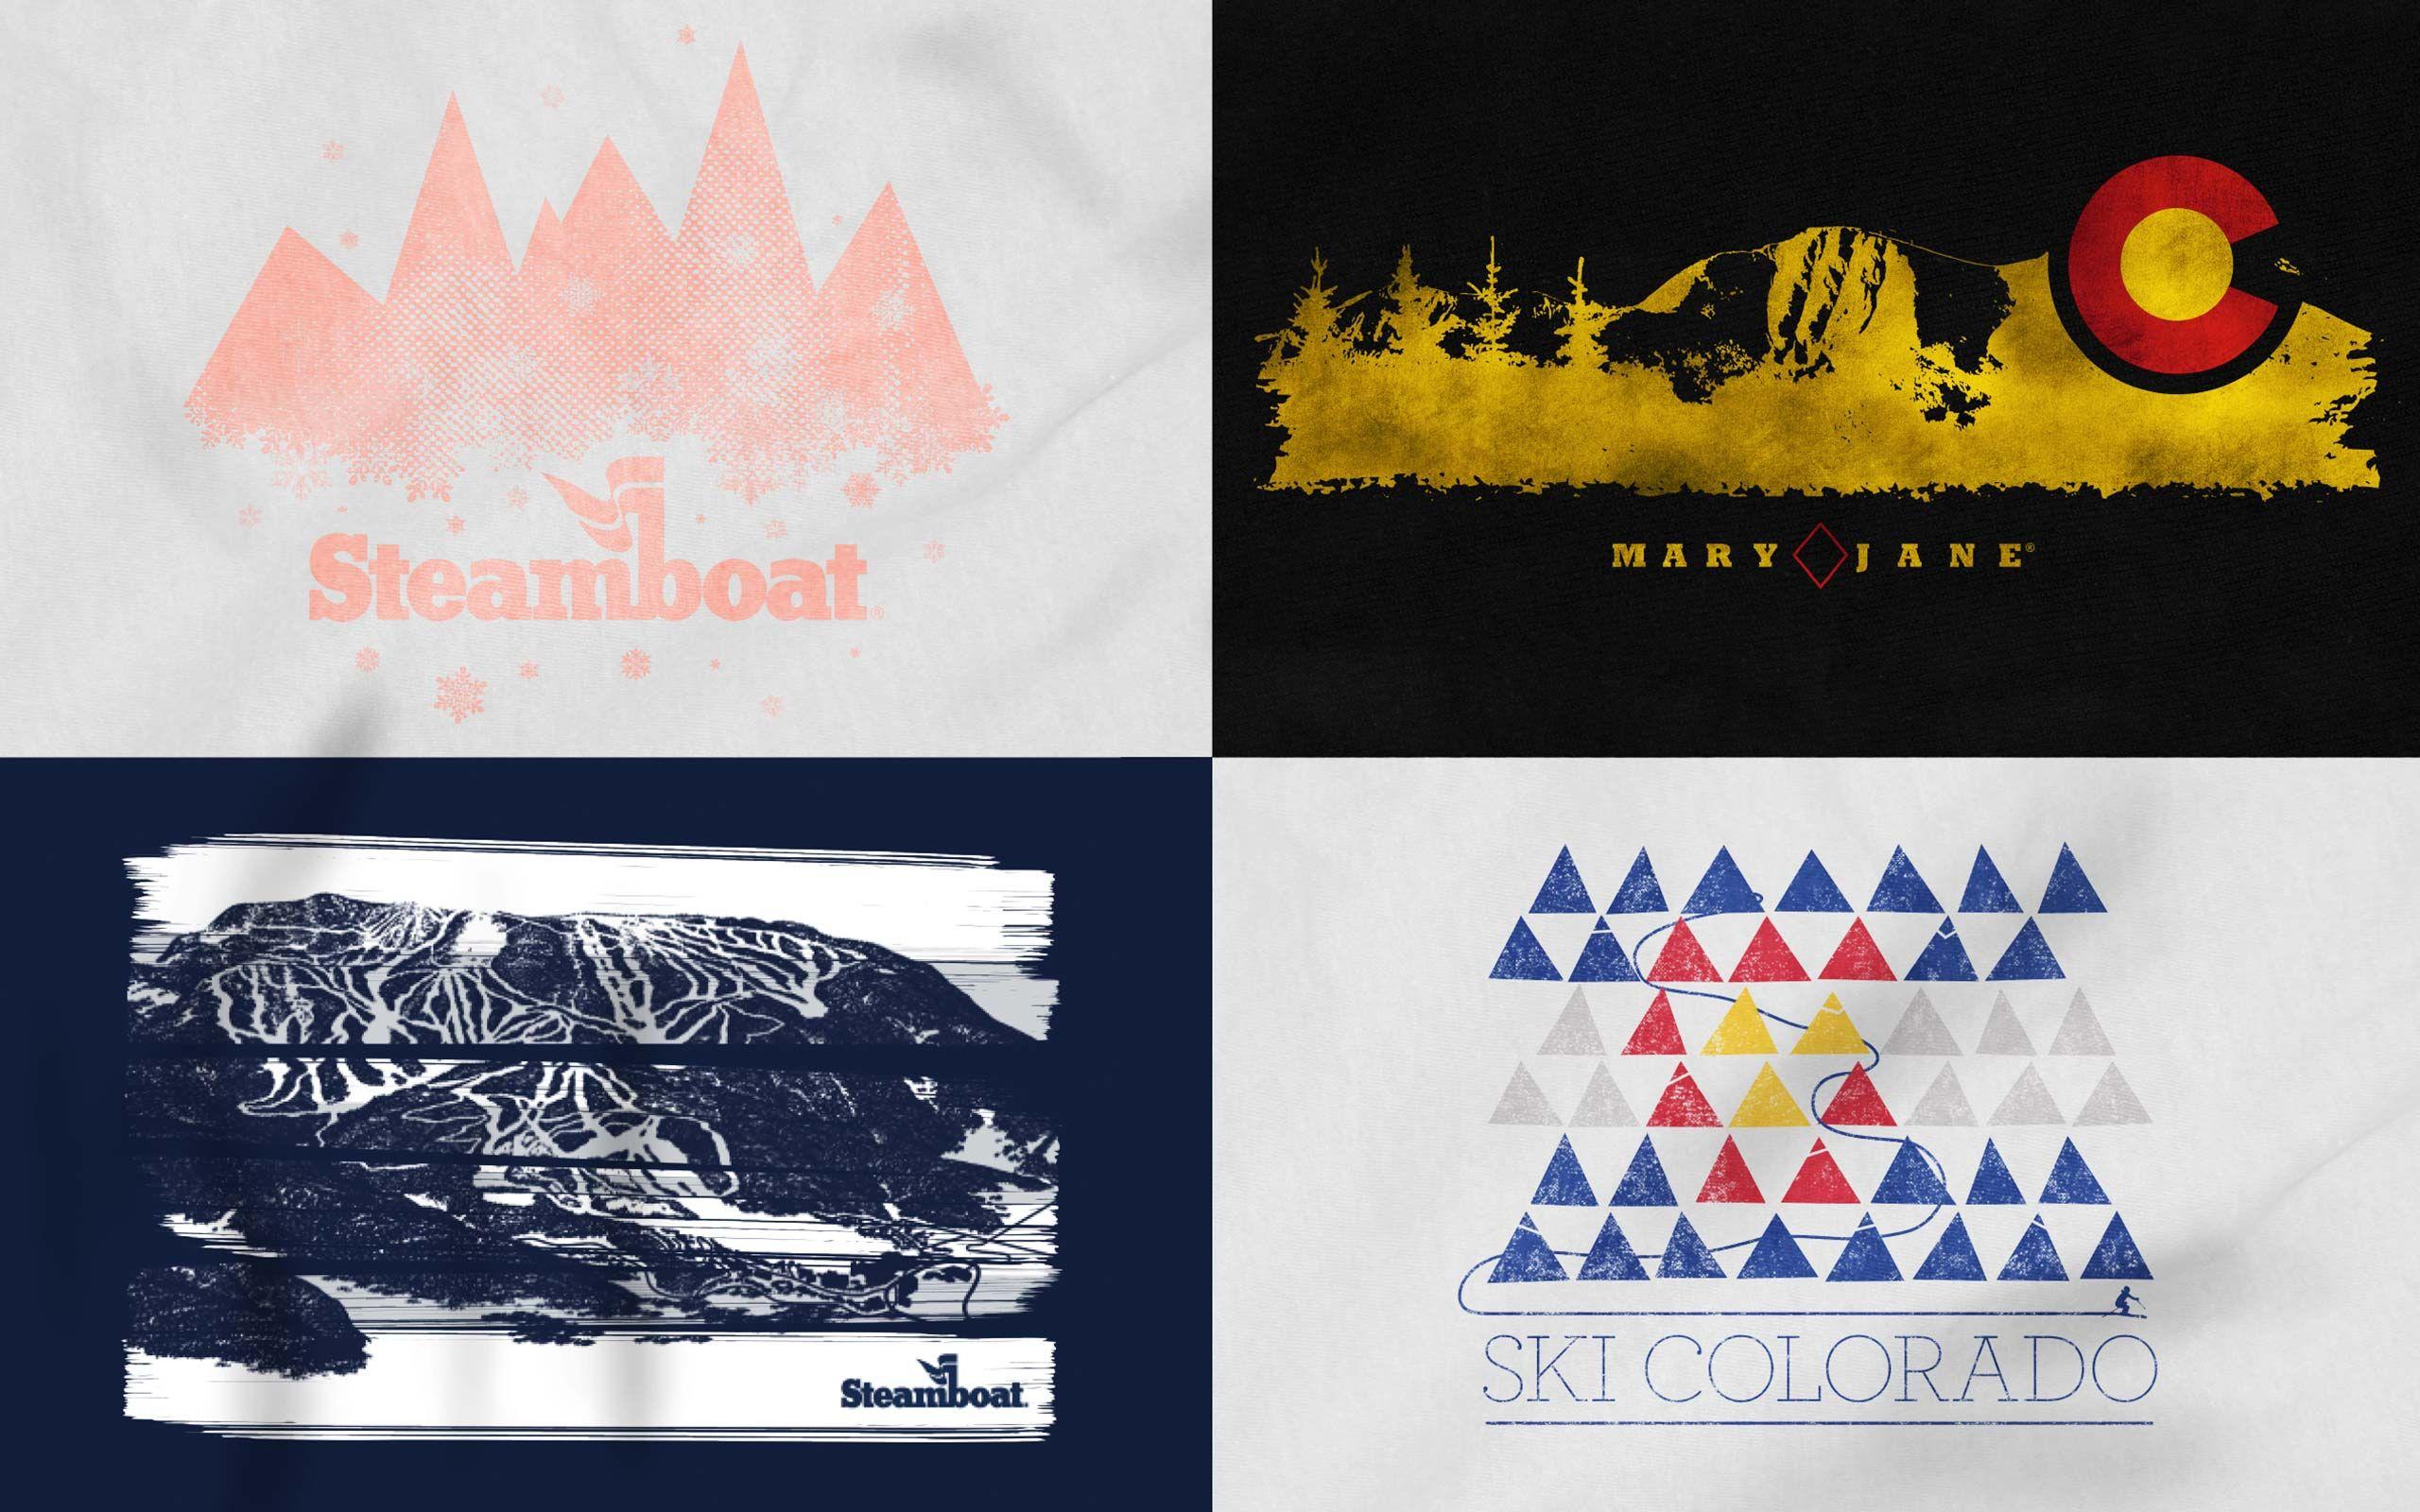 intrawest - colorado ski resort shirt designs #intrawest #colorado